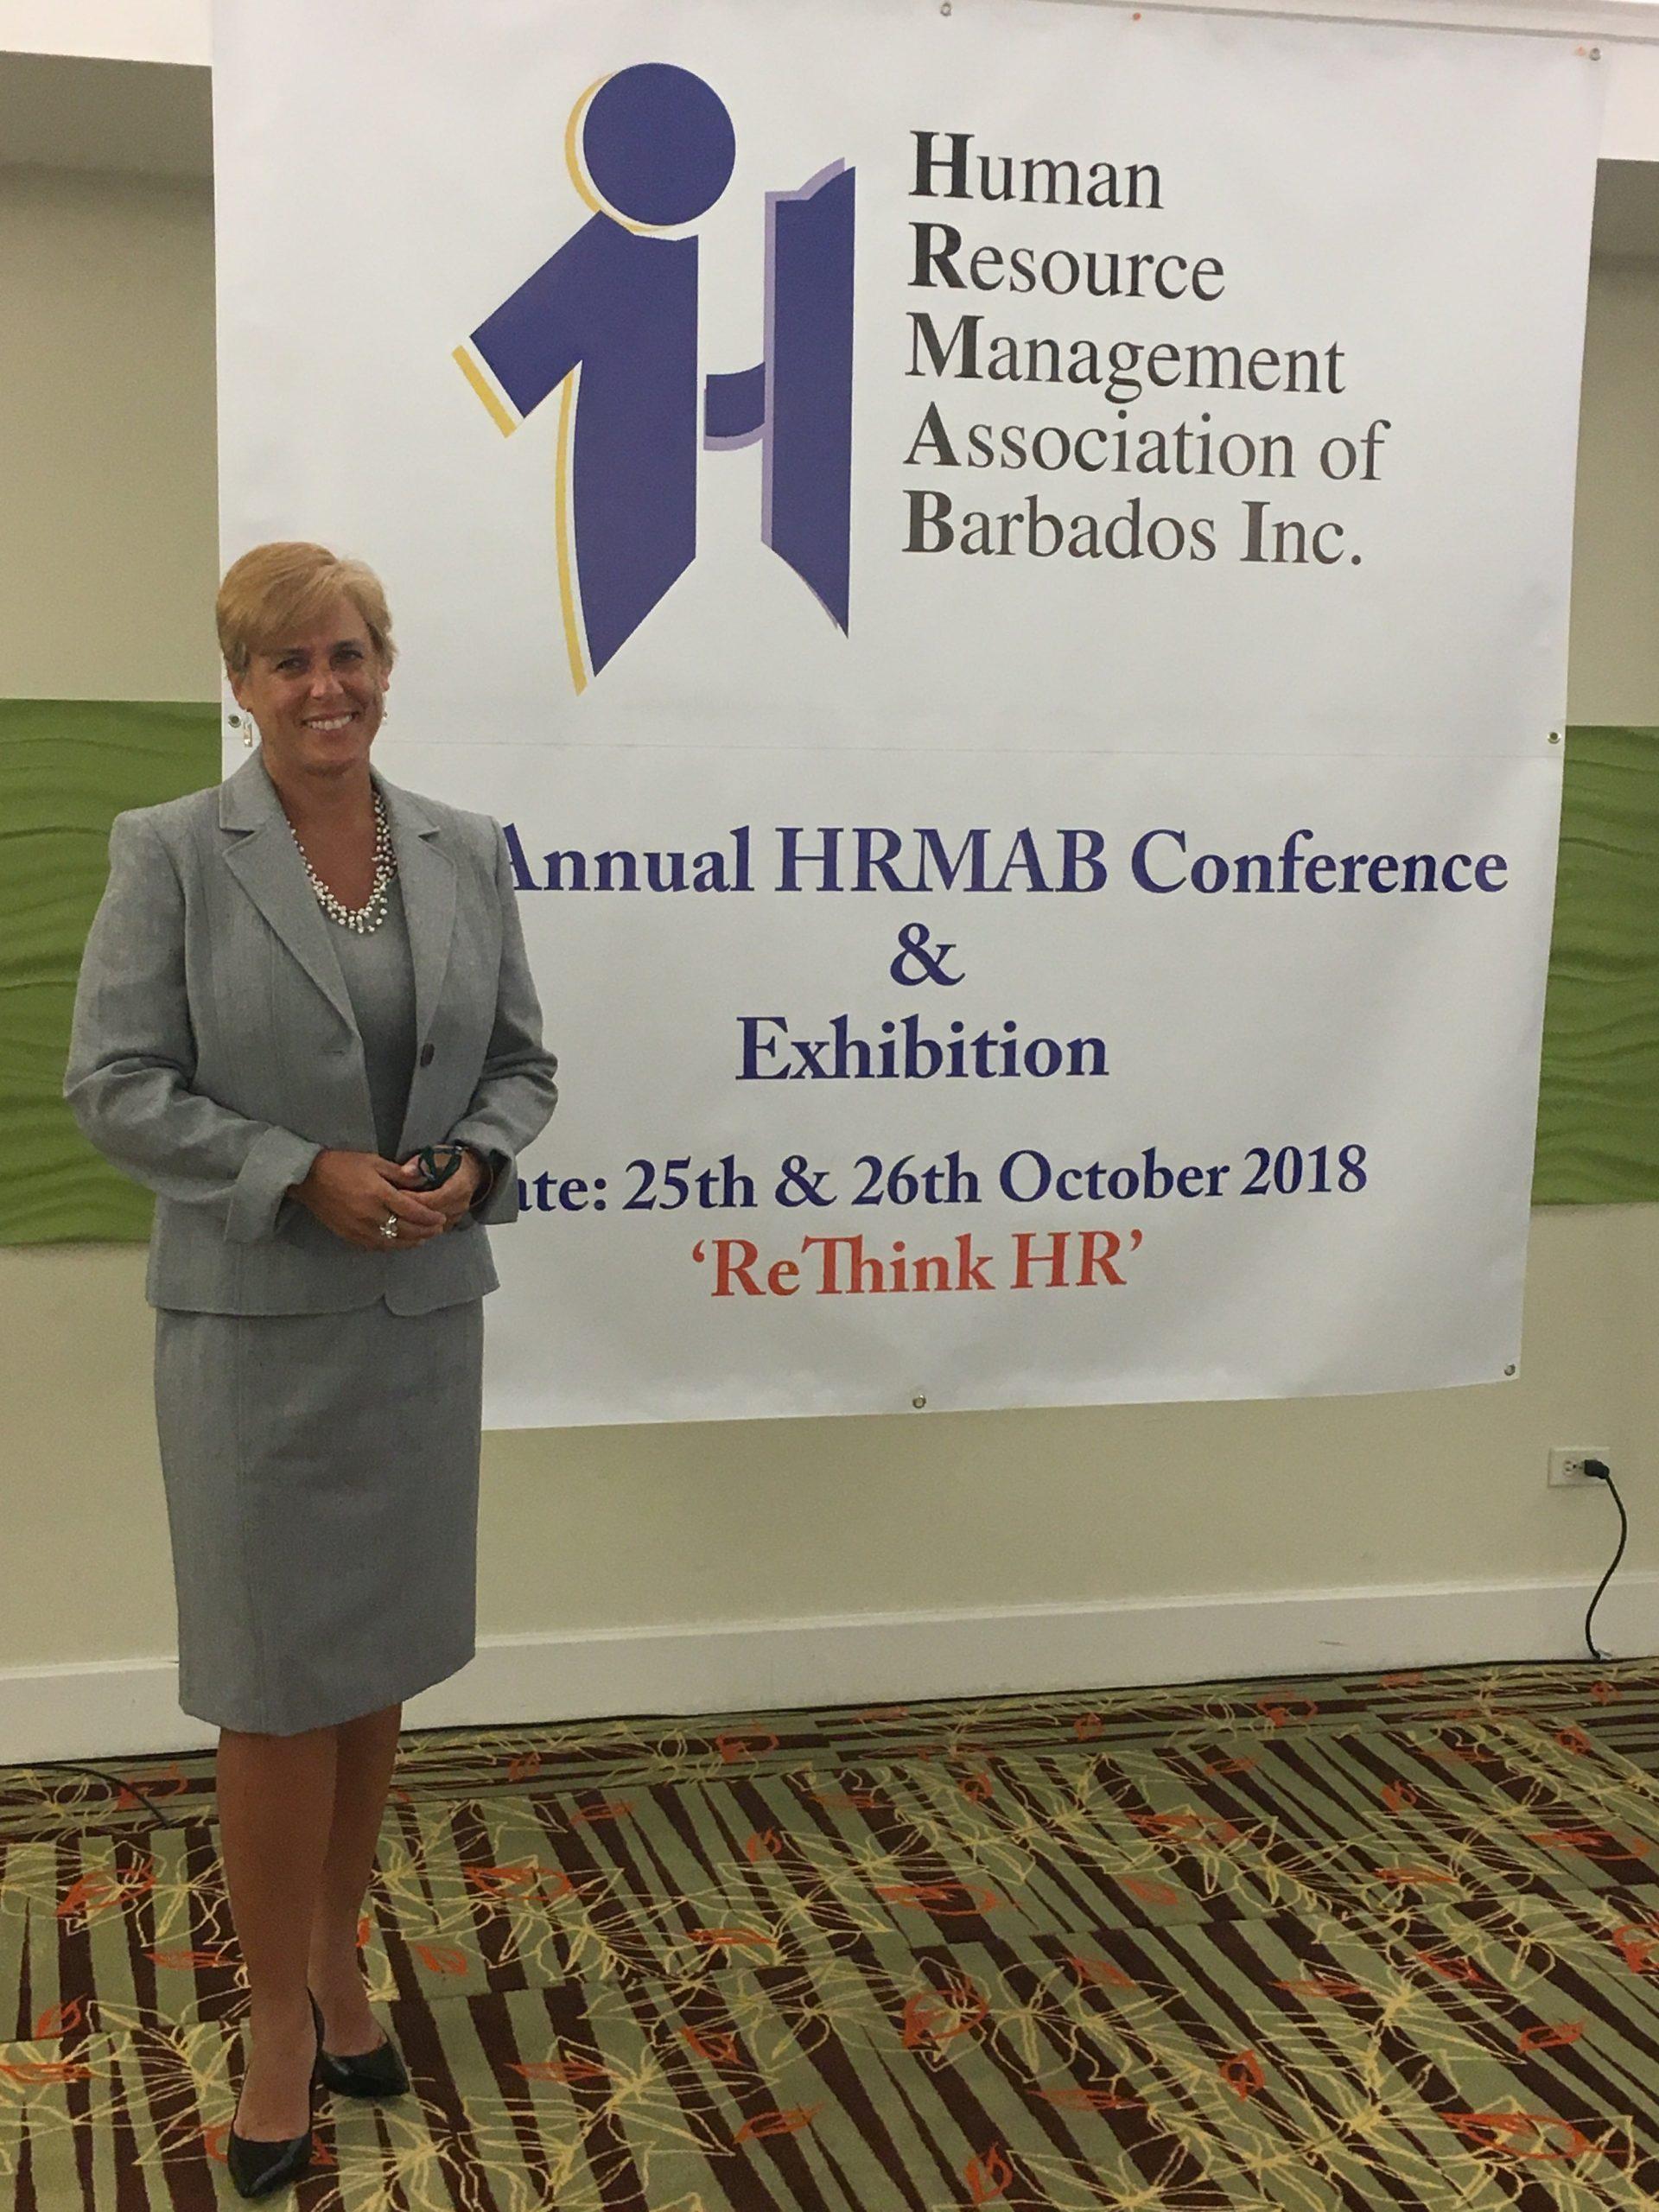 Human Resources Management Association of Barbados, Annual Conference 2018 (Bridgetown, Barbados)